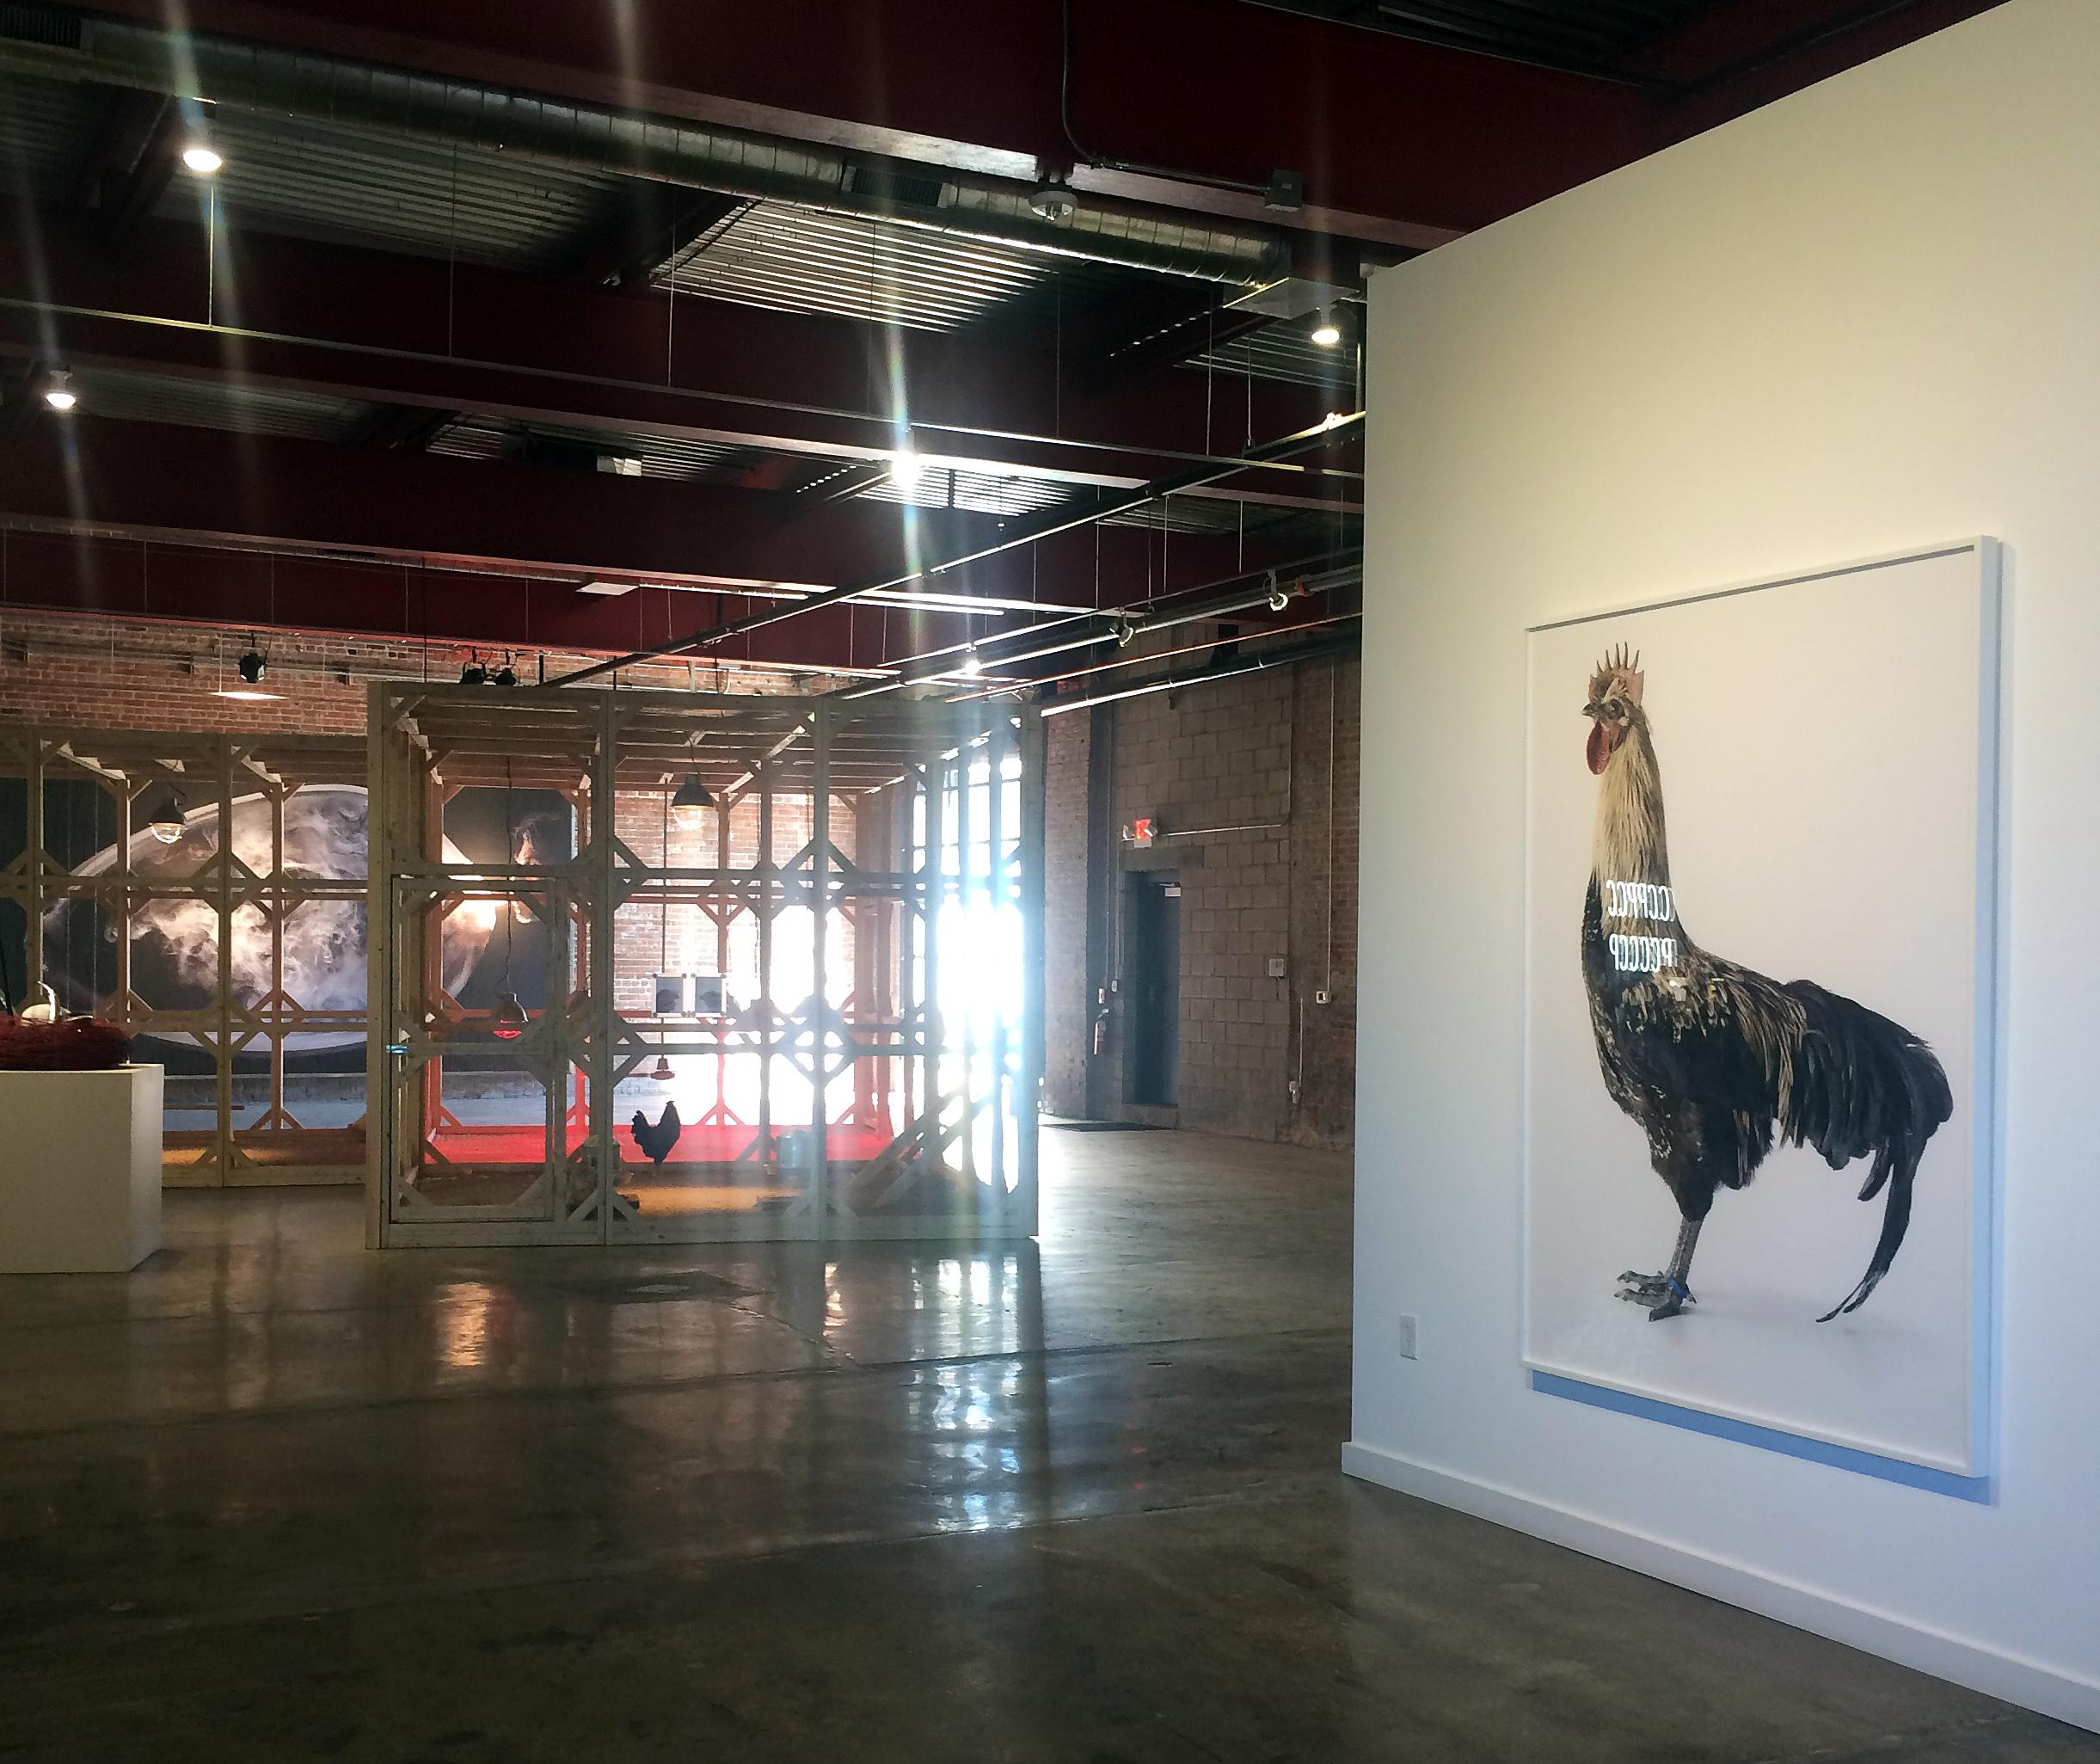 installation-image-energy-mass-wasserman-projects